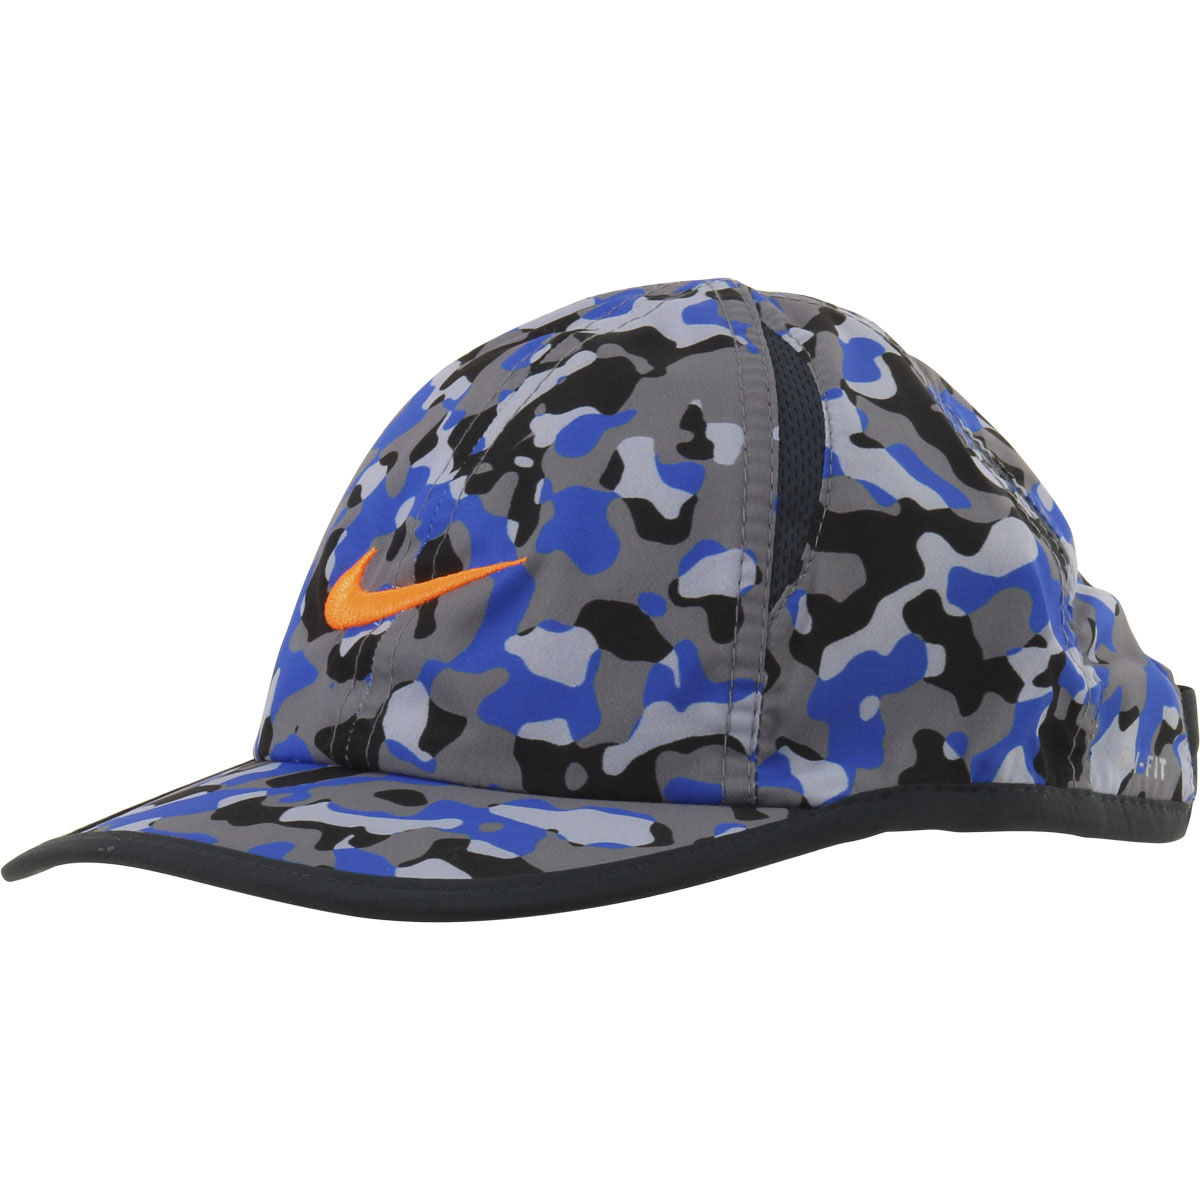 nike boy s dri fit embroidered logo baseball cap hat